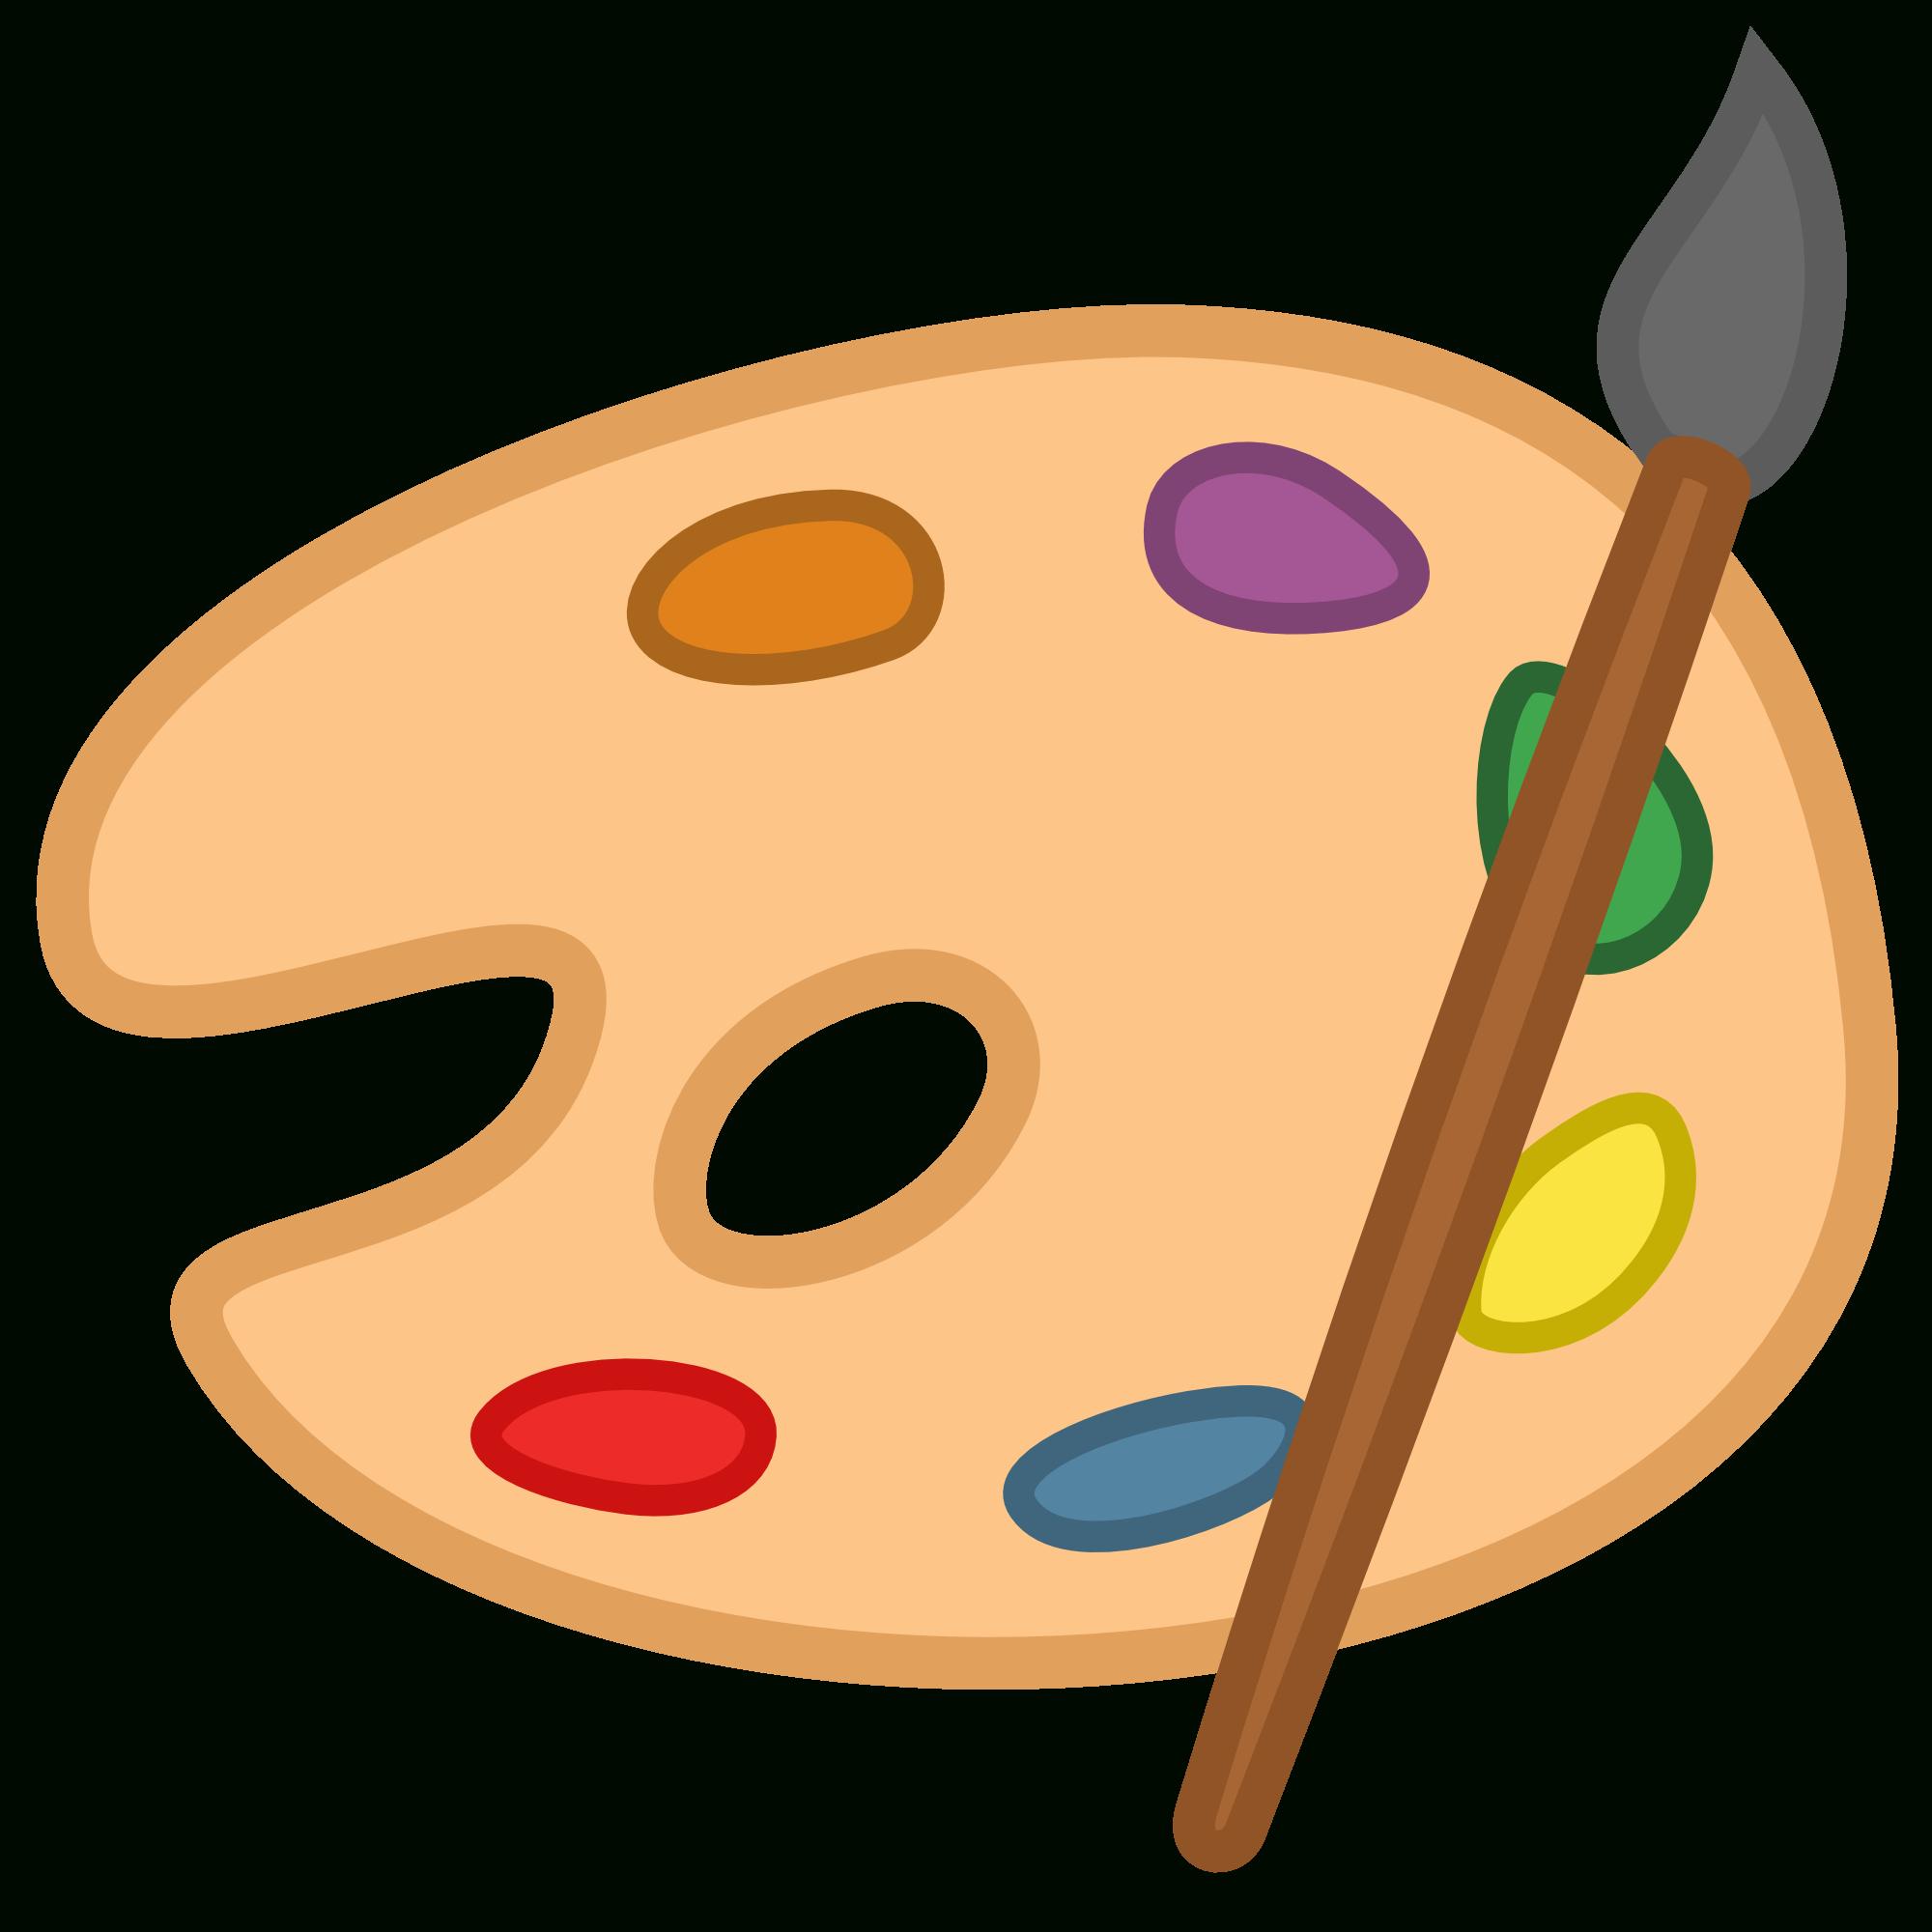 Free Paint Palette Clipart, Download Free Clip Art, Free Clip Art On - Free Printable Paint Palette